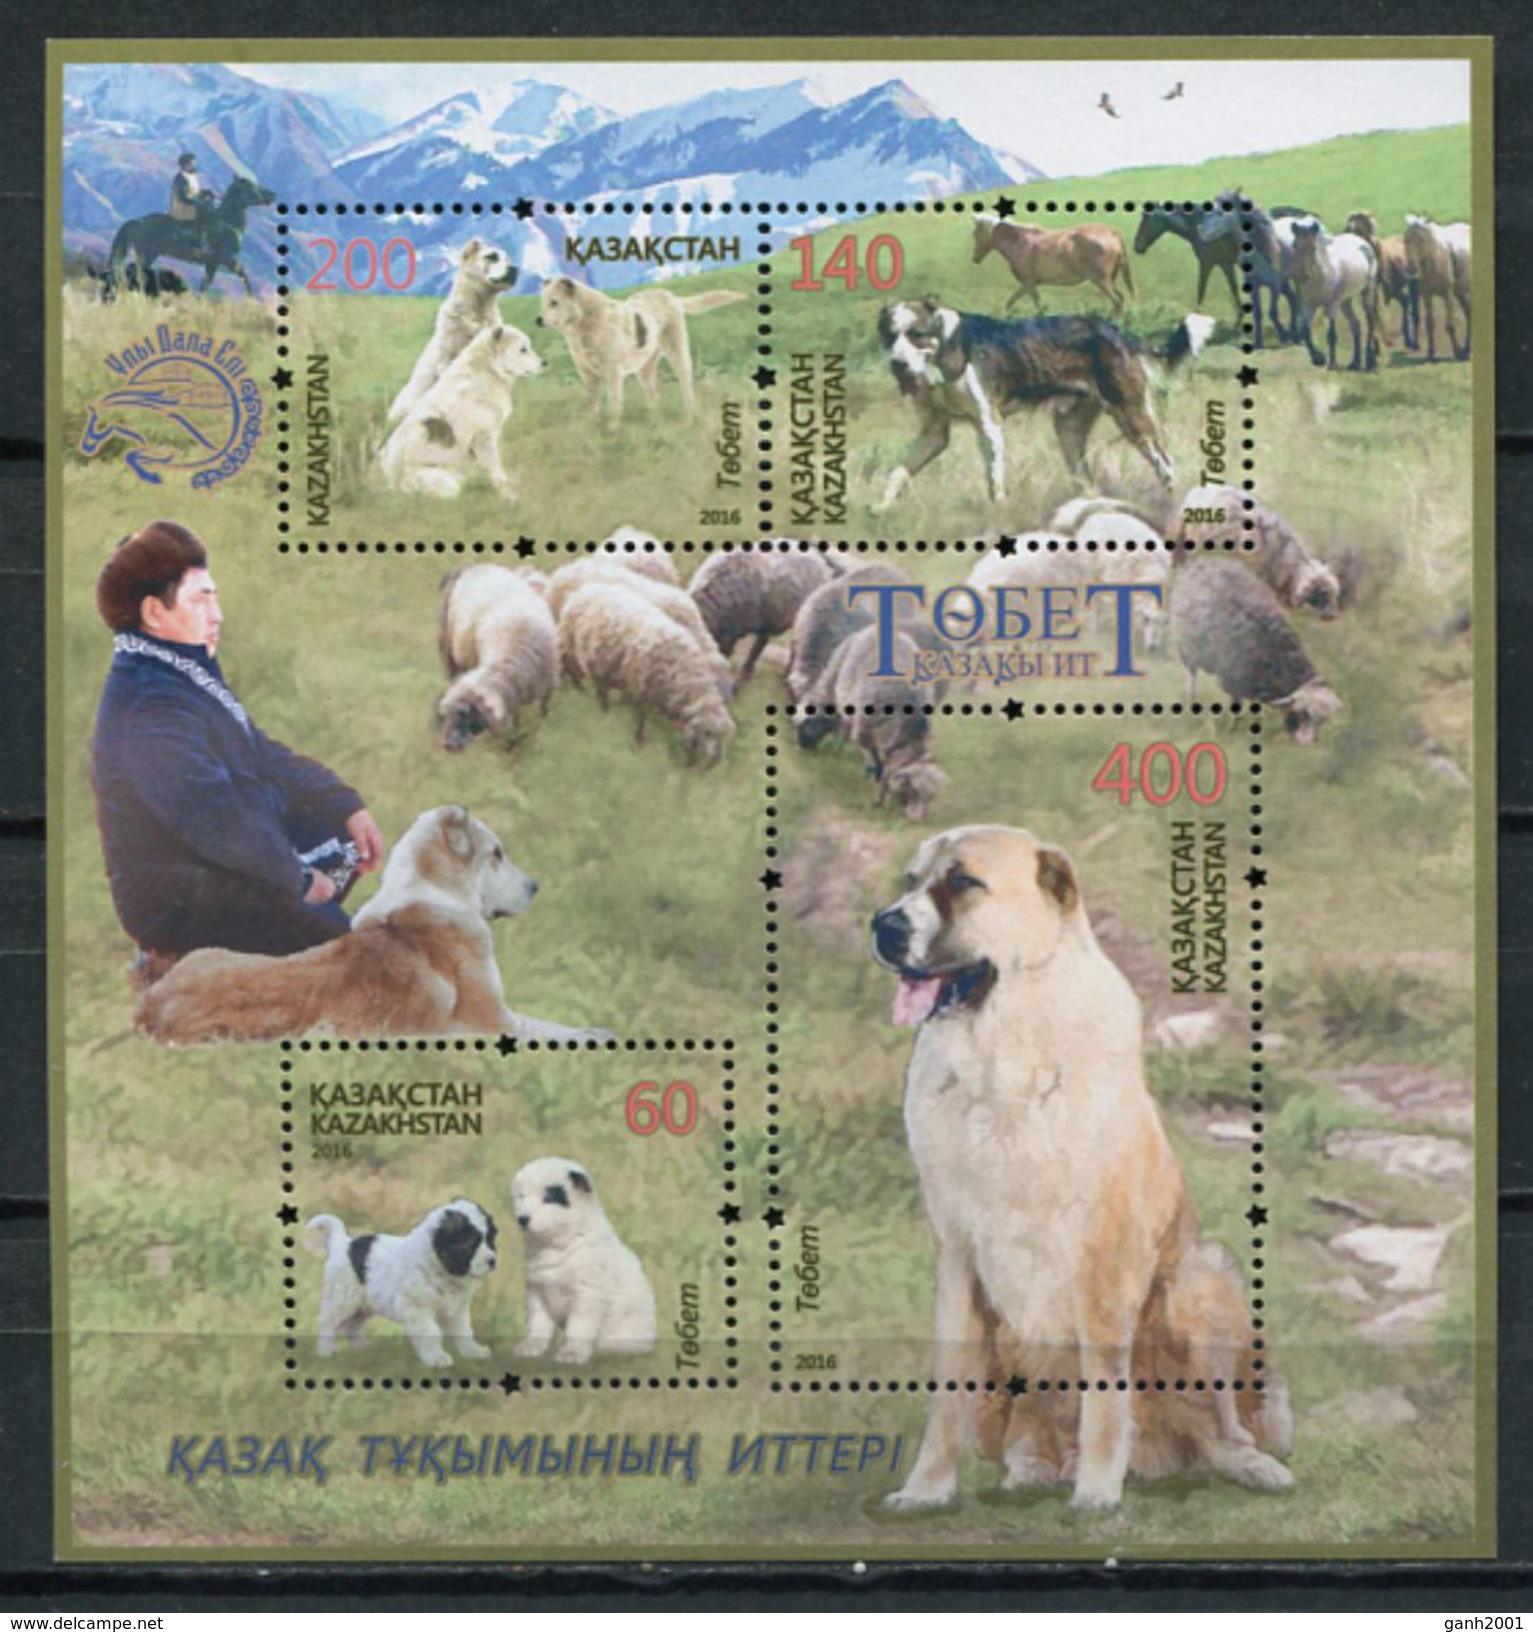 Kazakhstan 2016 / Dogs MNH Chiens Hunde Perros / Cu4921  40-54 - Perros